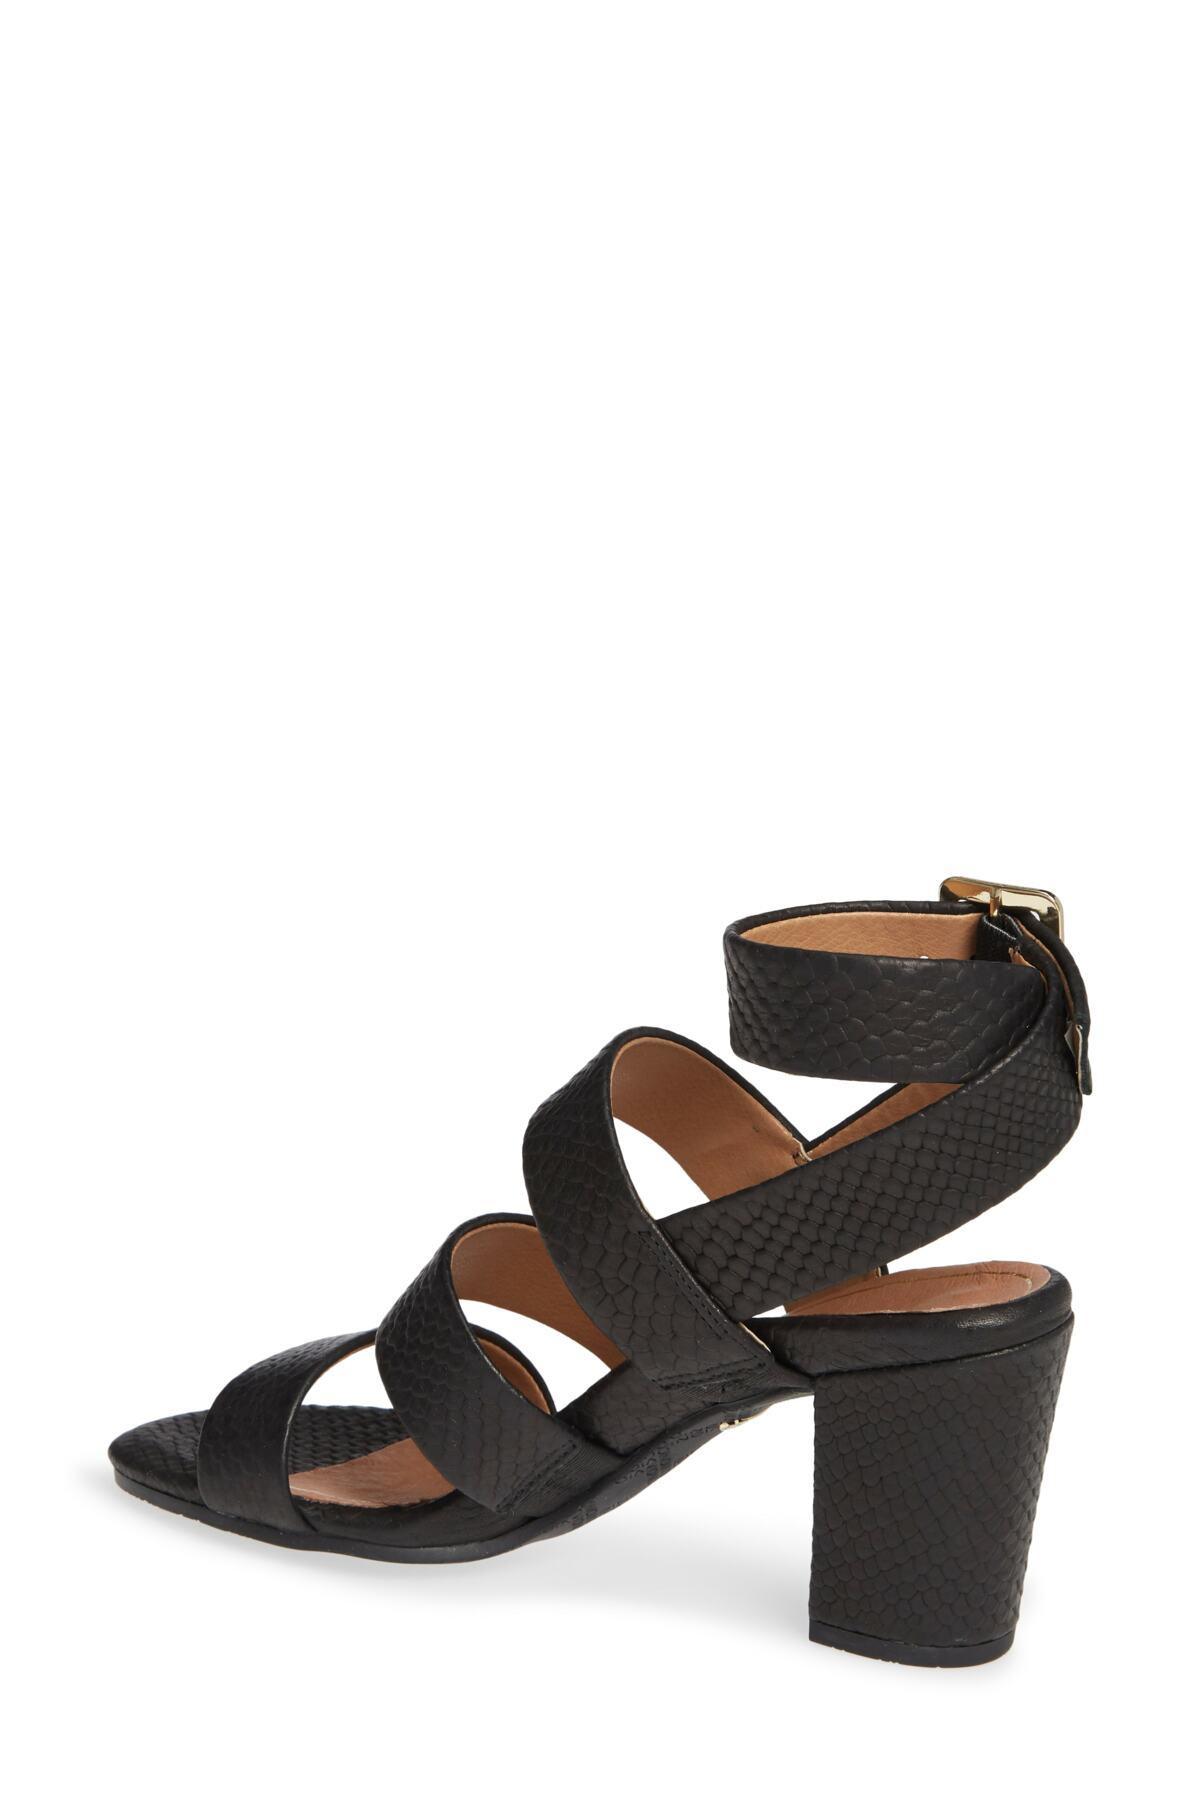 333be25da202 Lyst - Vionic Blaire Block Heel Sandal (women) in Black